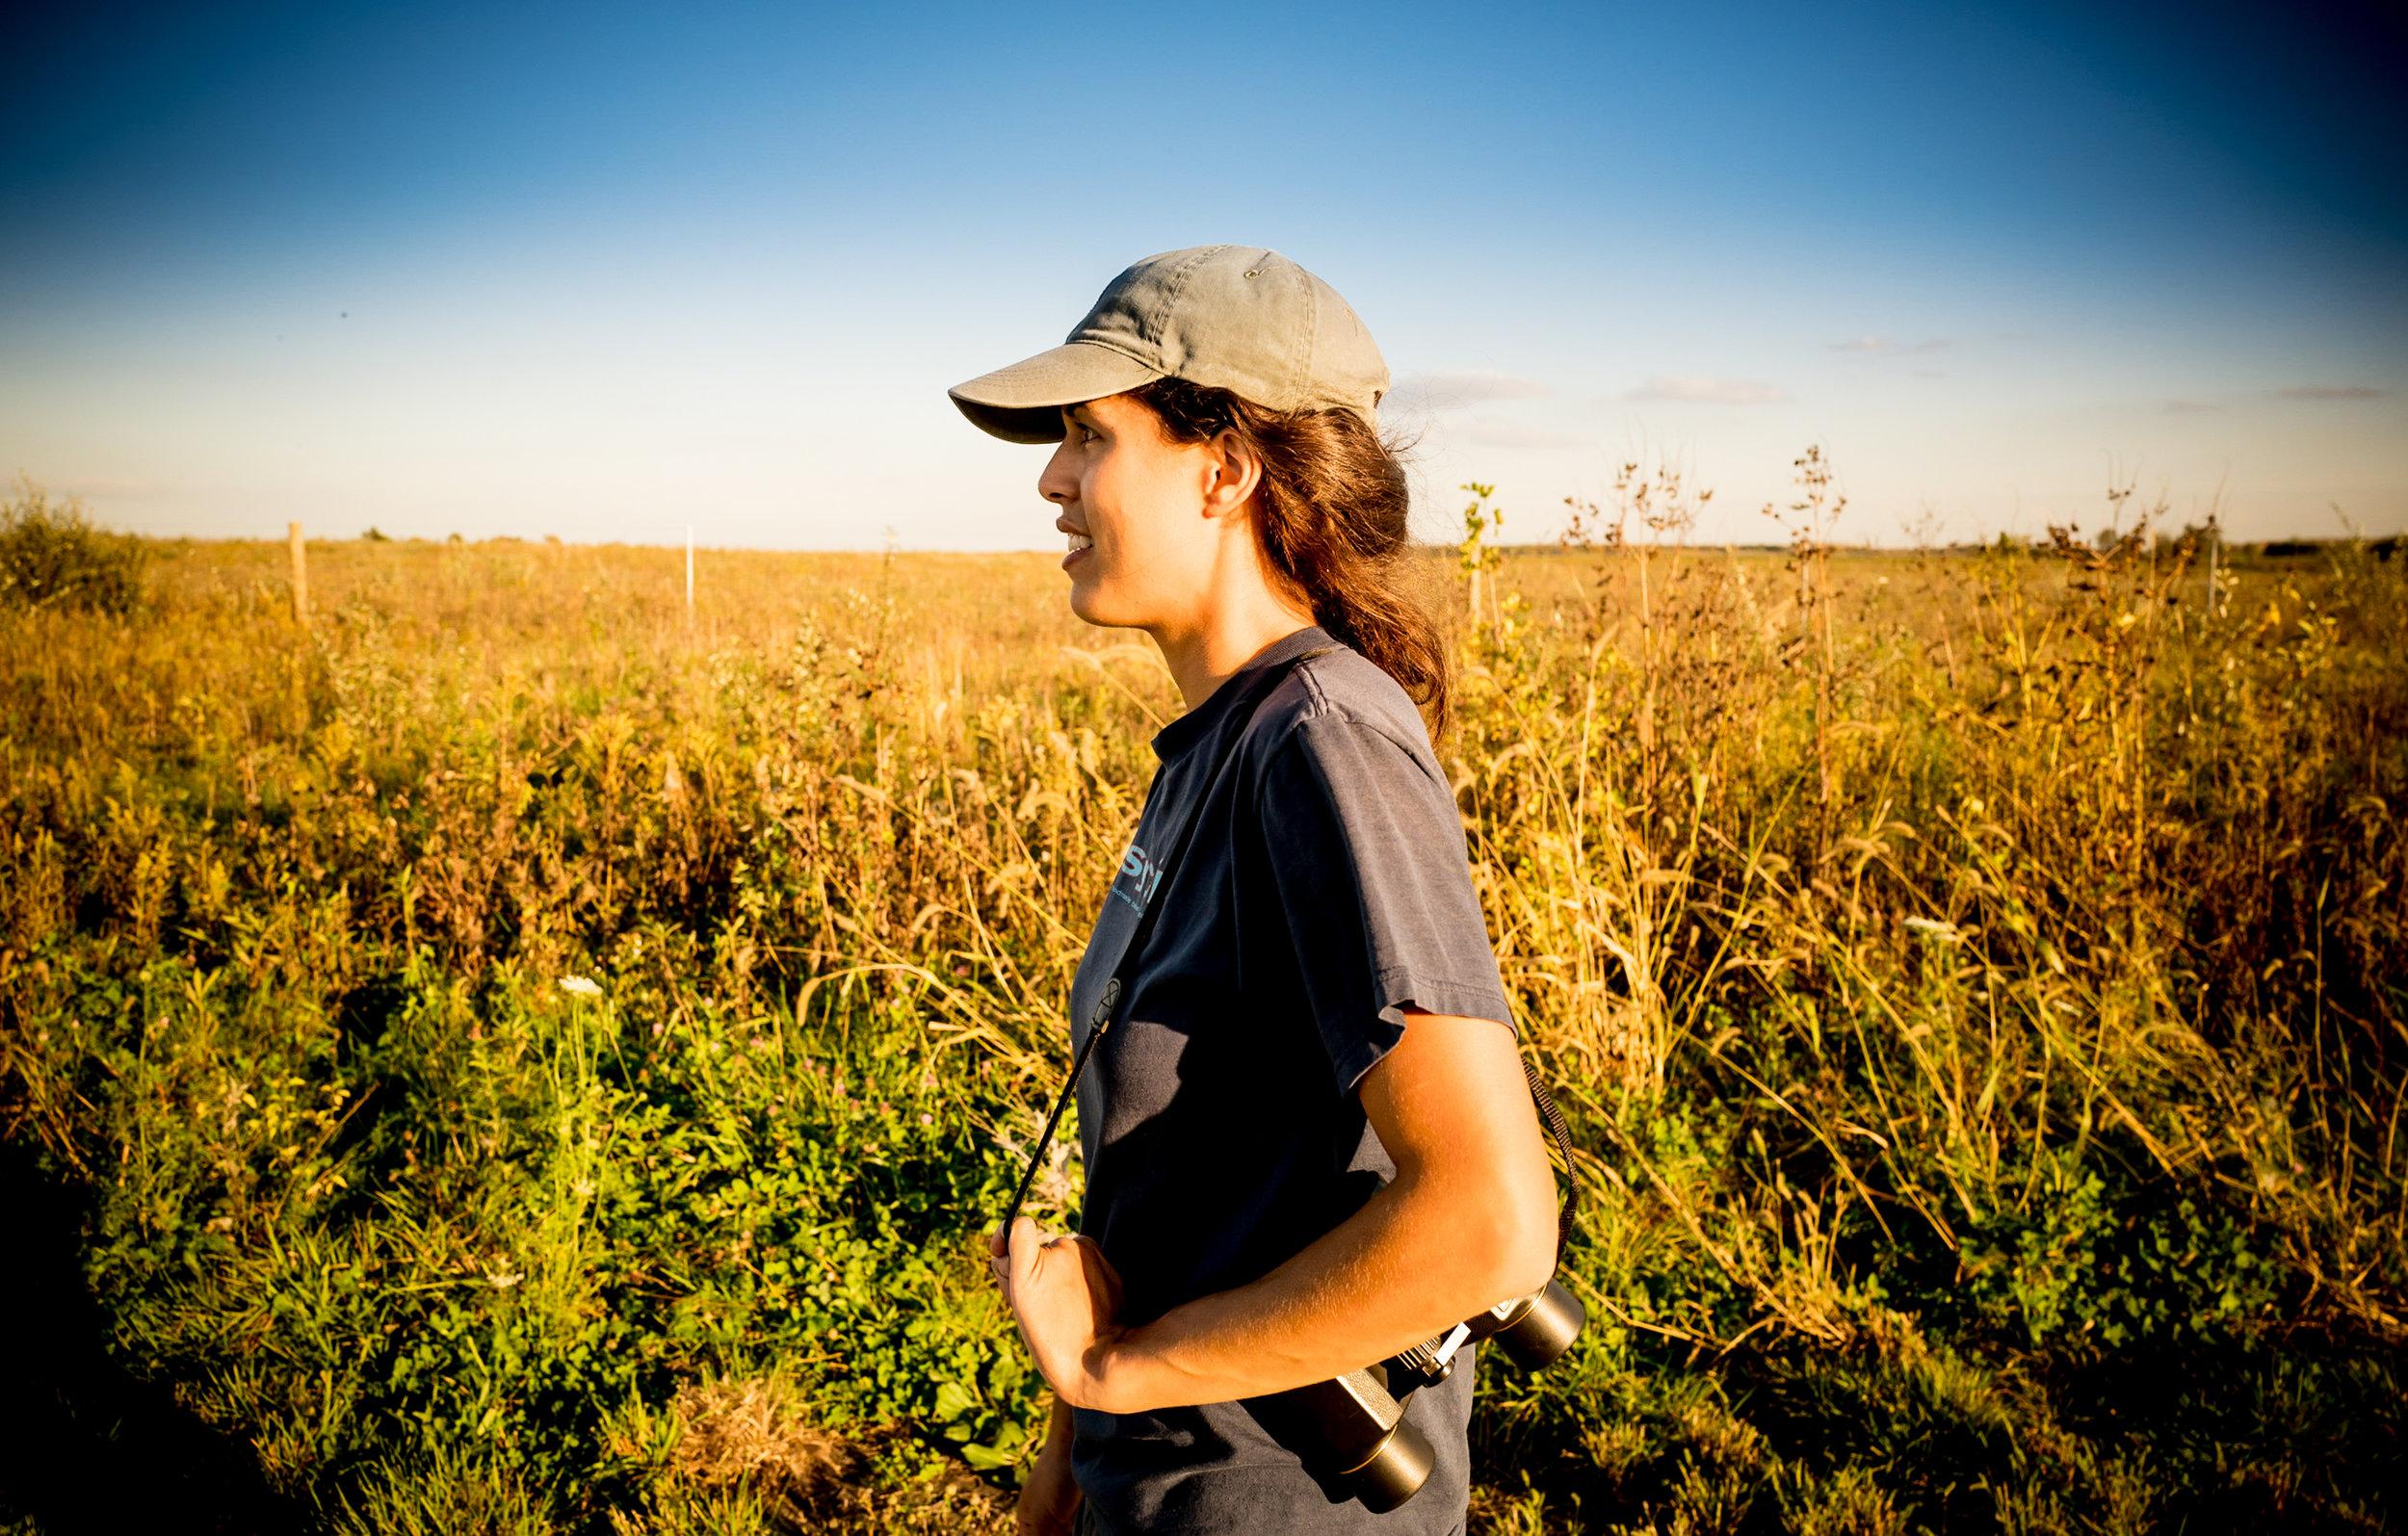 Grace at Midewin National Tallgrass Prairie